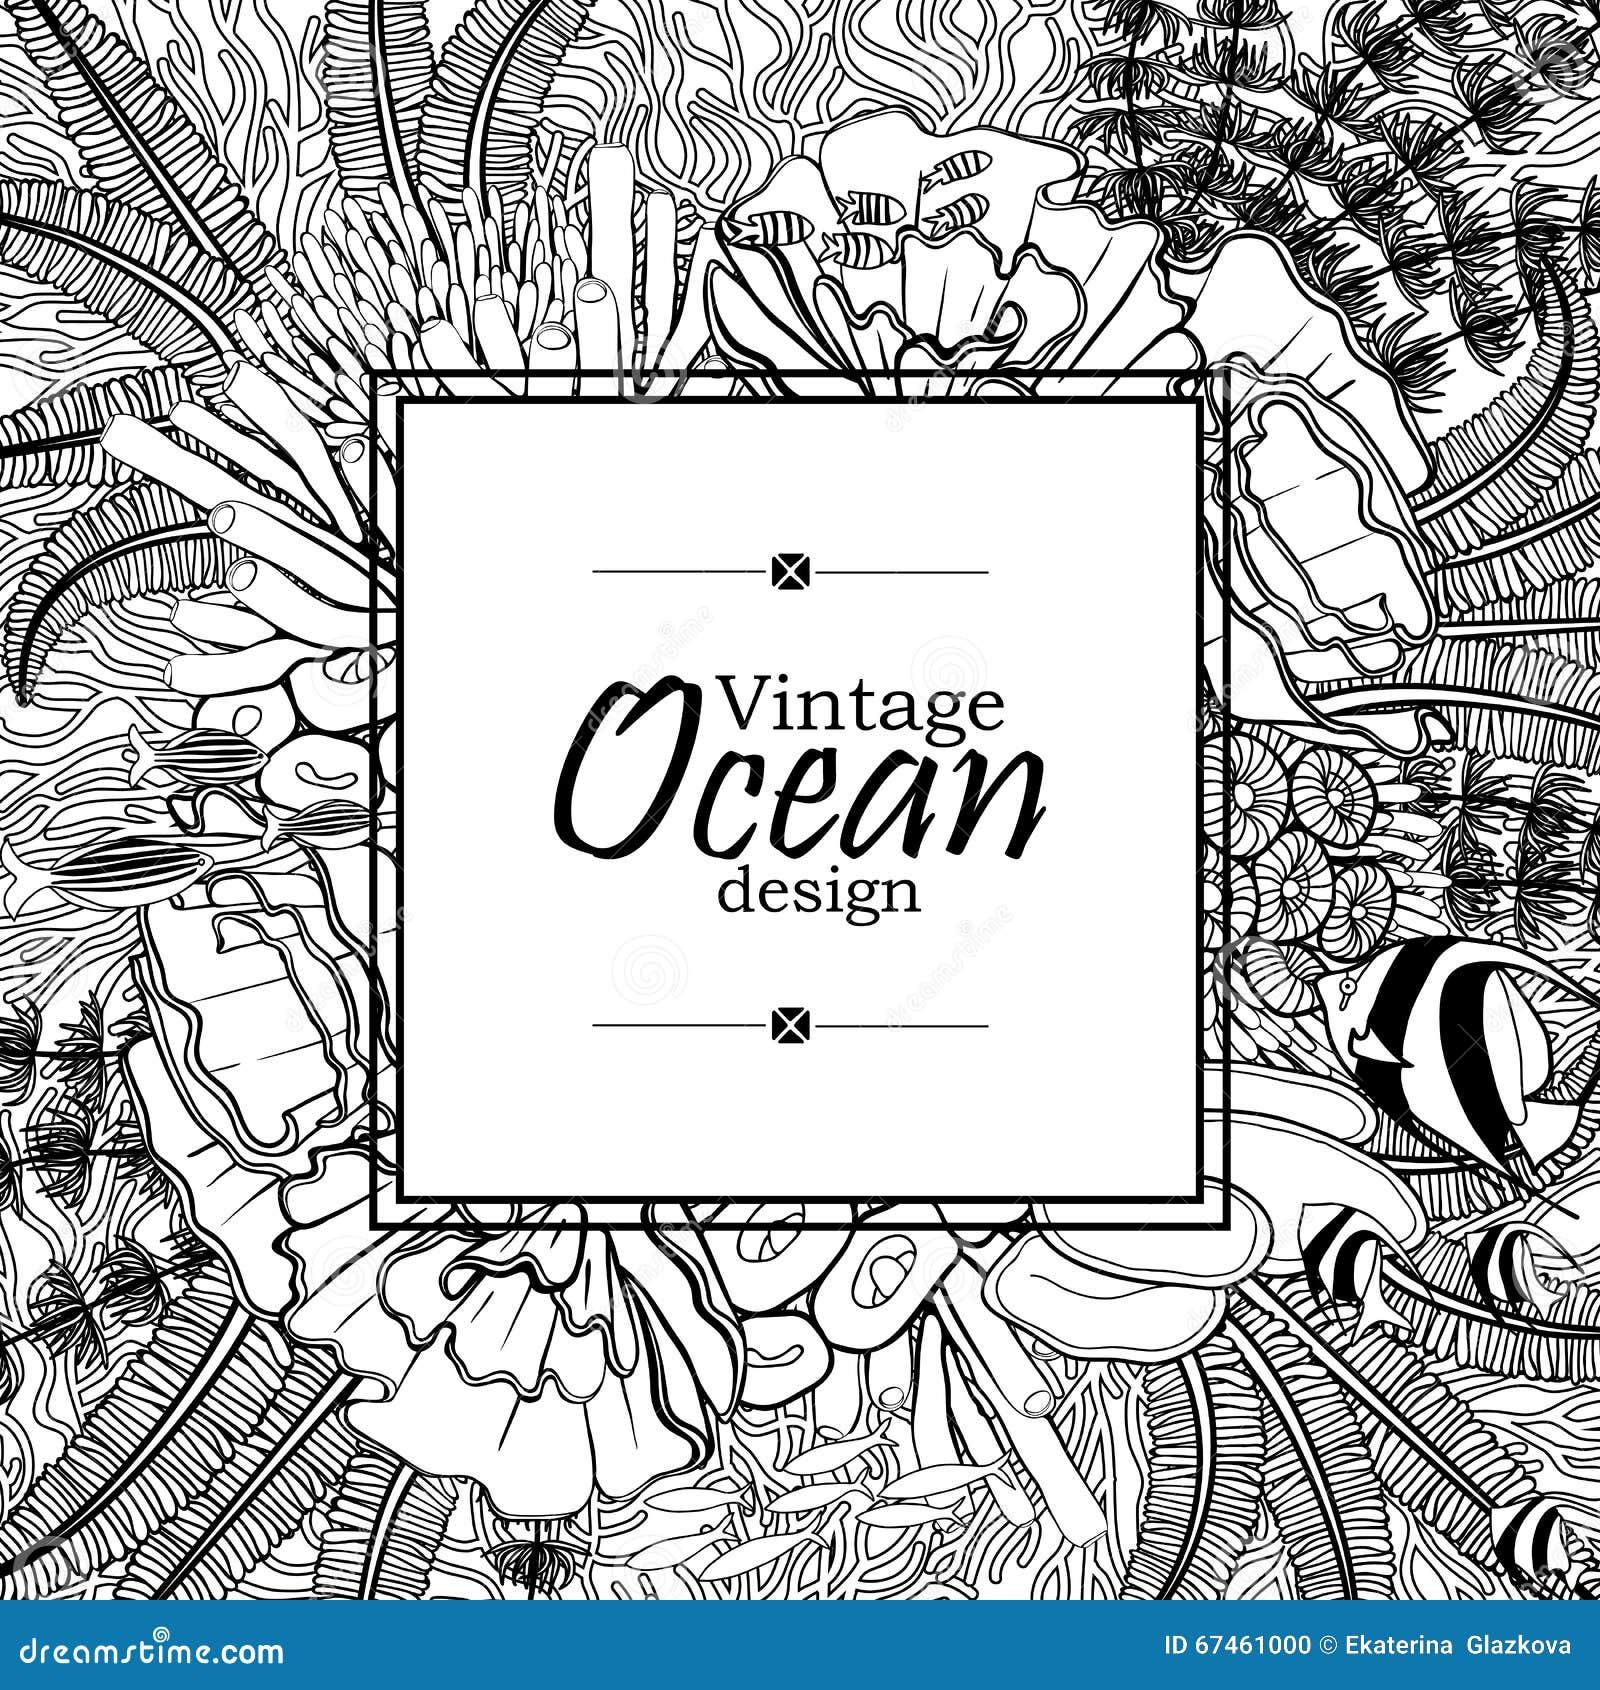 Line Art Card Design : Ocean line art design stock vector image